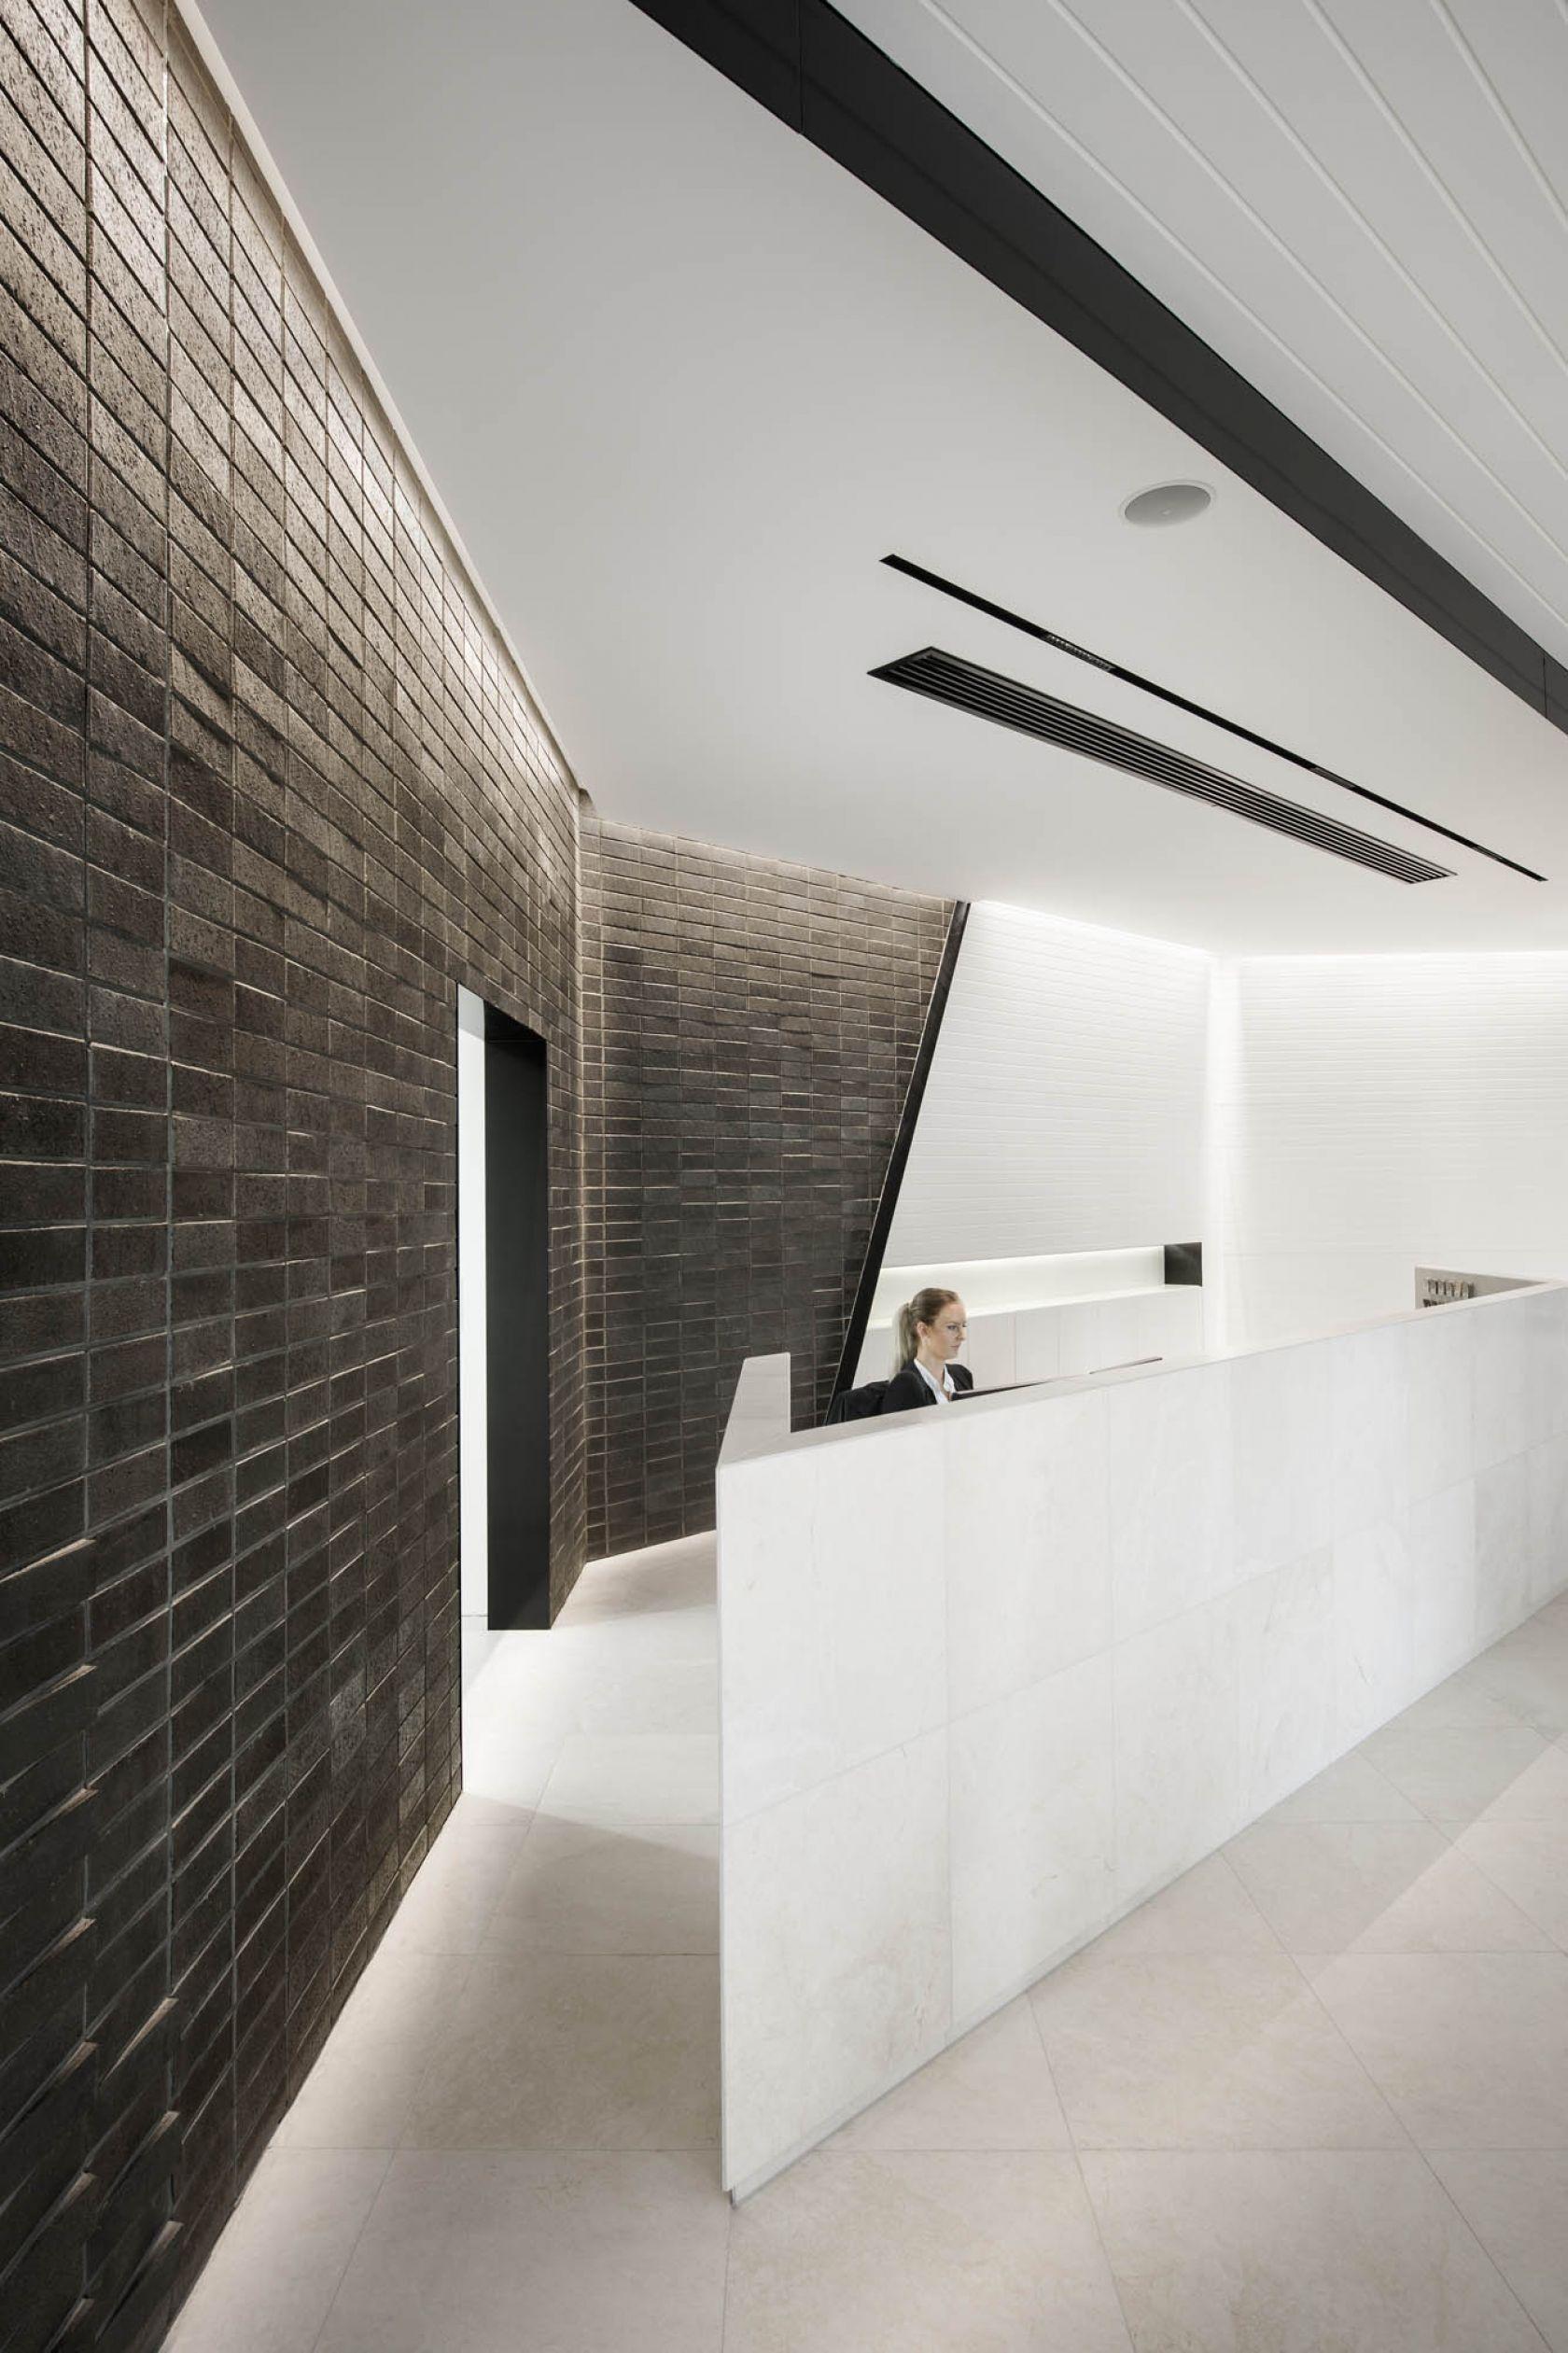 brickworks design austral brick studio adelaide fitout construction reception bricks stone